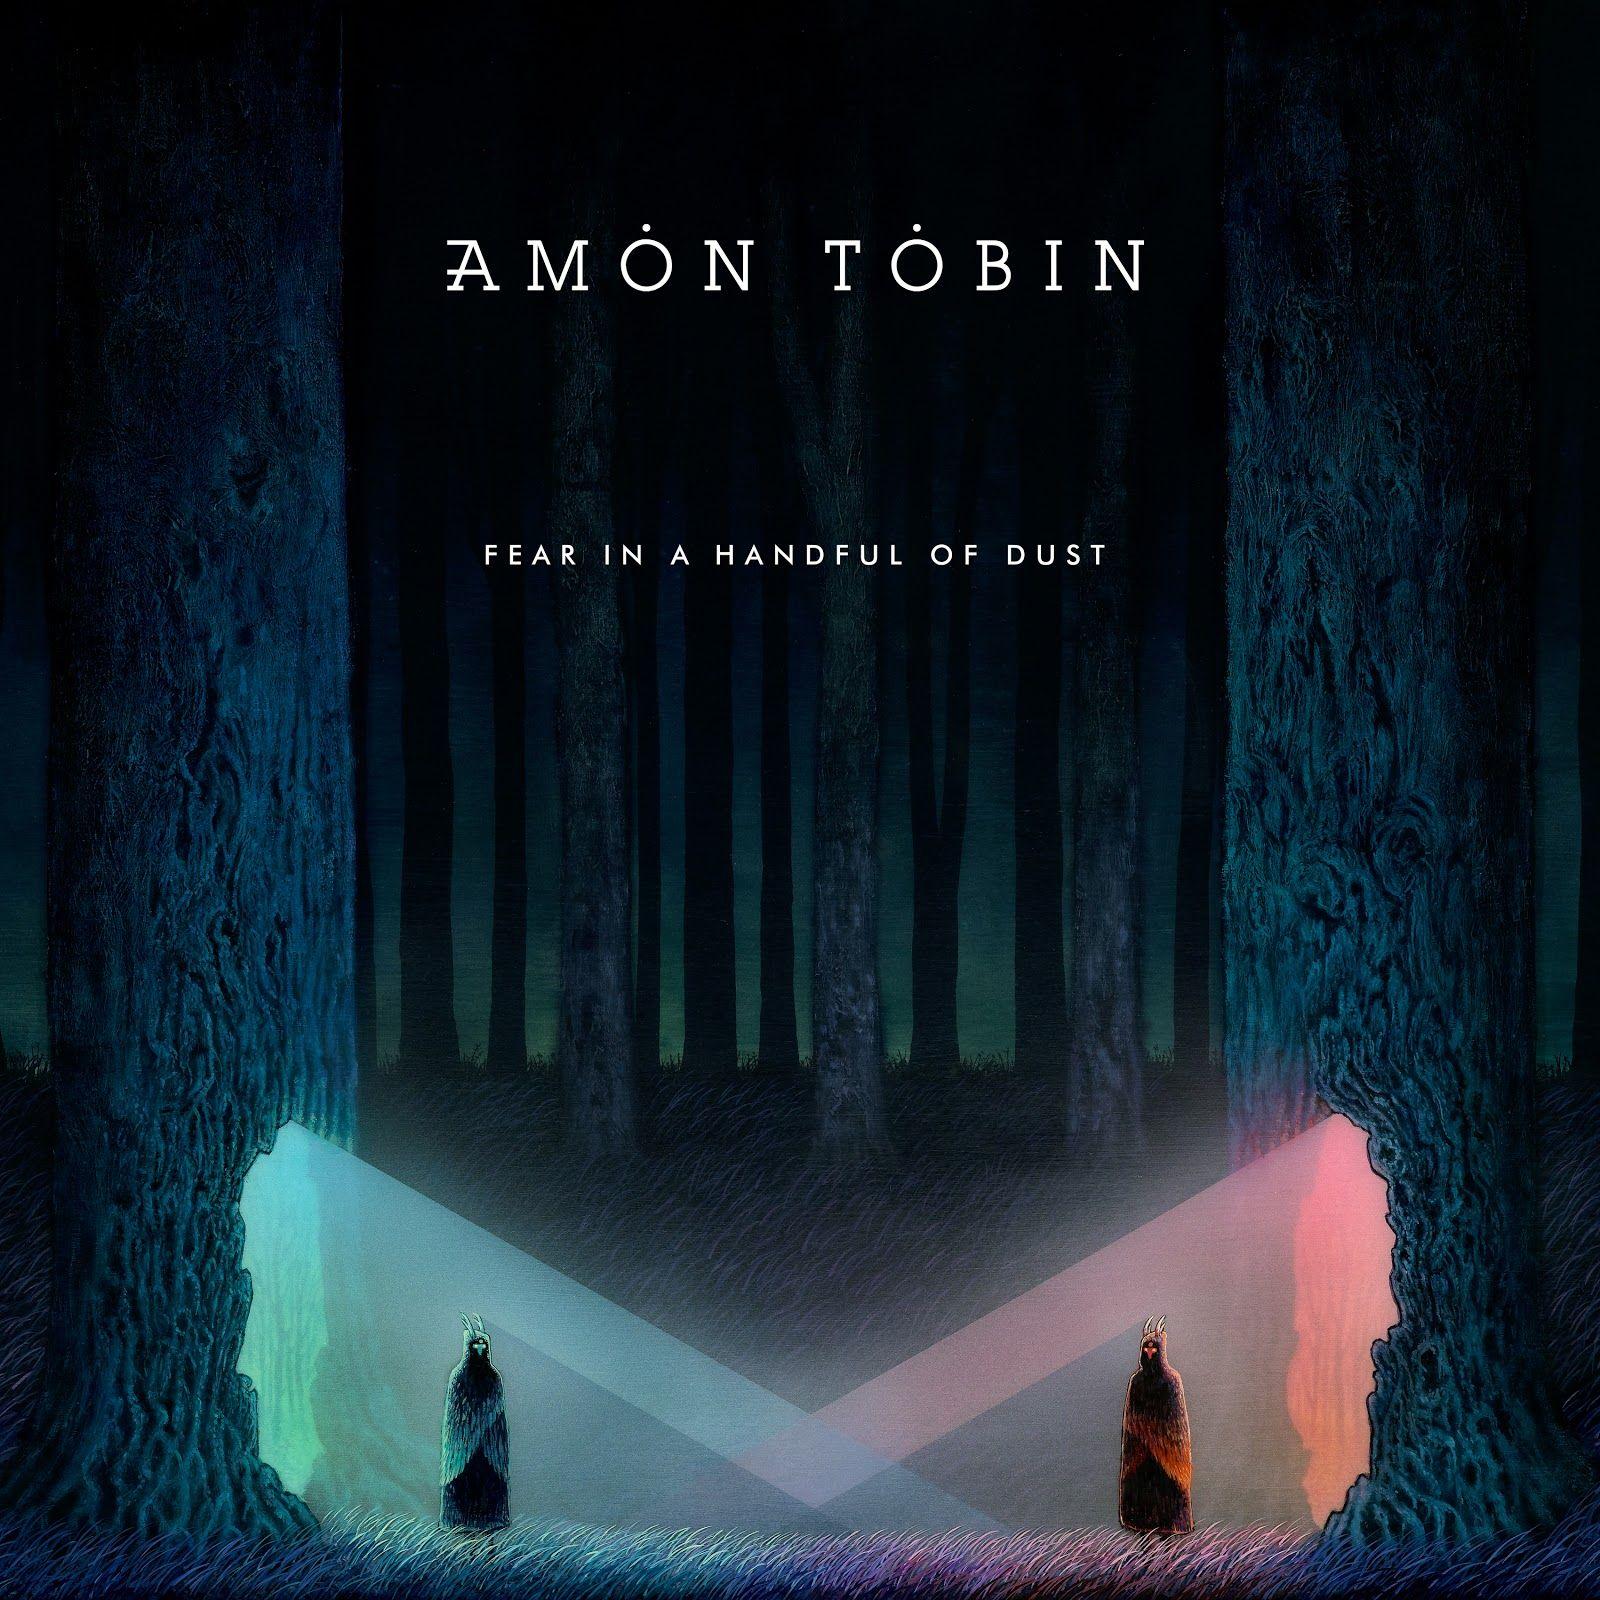 amontobin-feardust-fullres-3000px-album.jpg